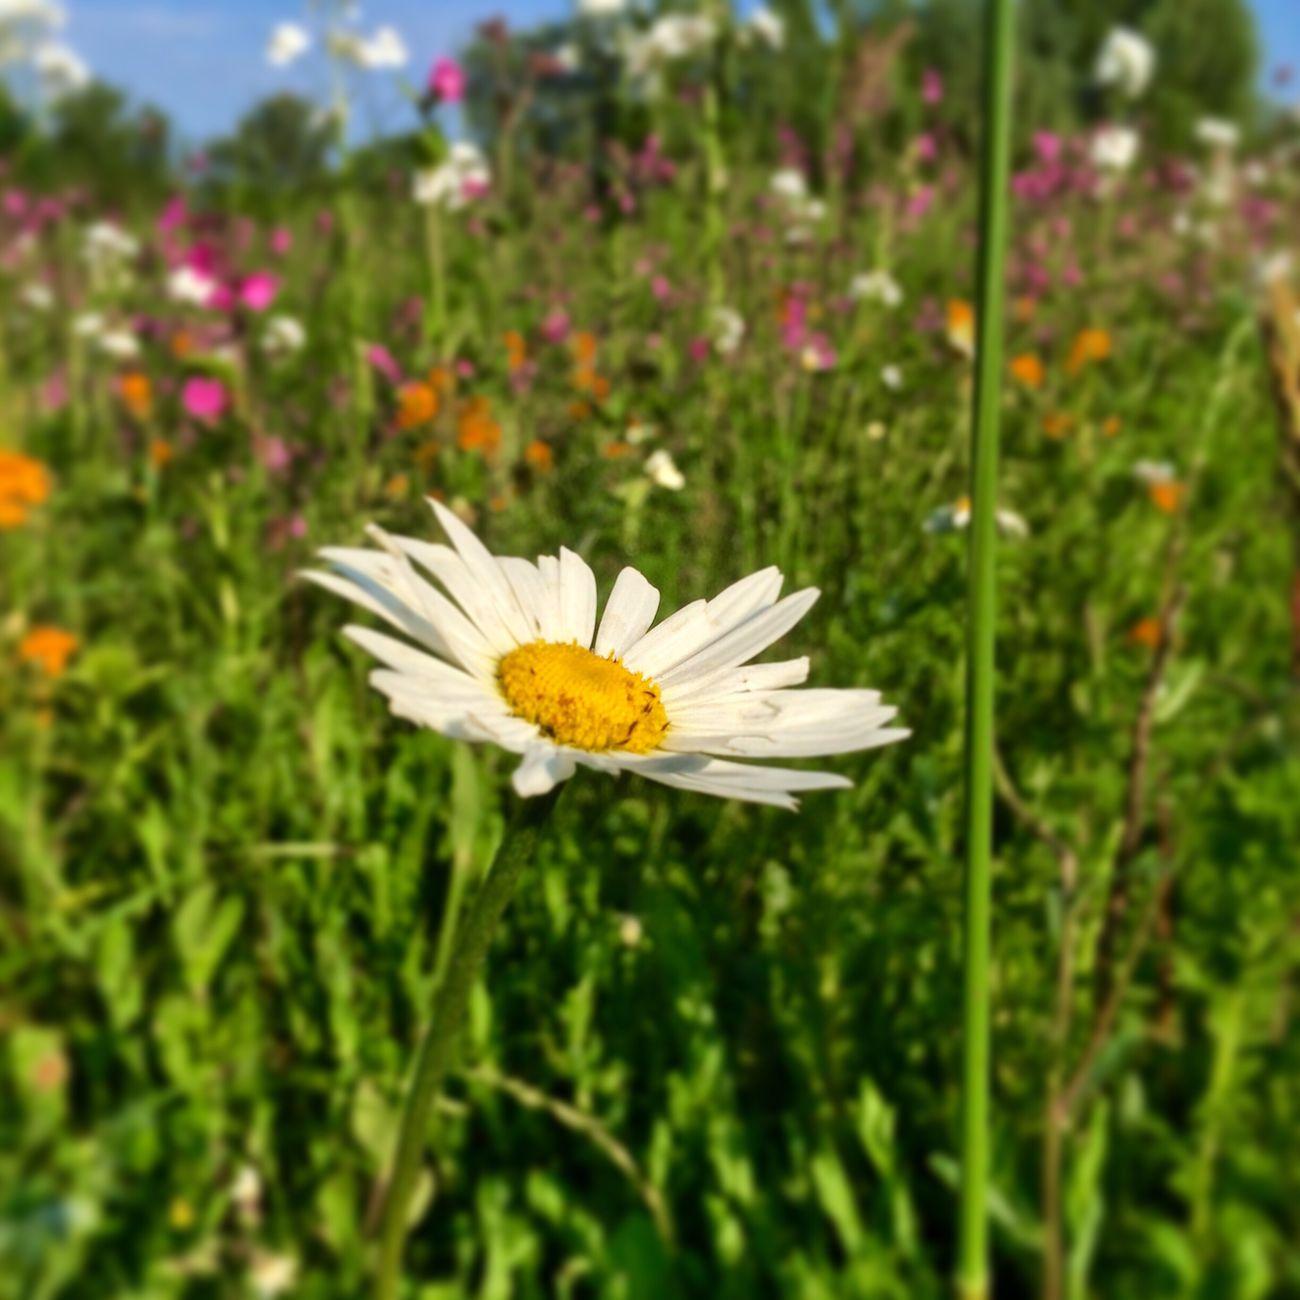 The Essence Of Summer Flowers Daisy Daisy Flower Sunny Day Bavaria IPhone Photography